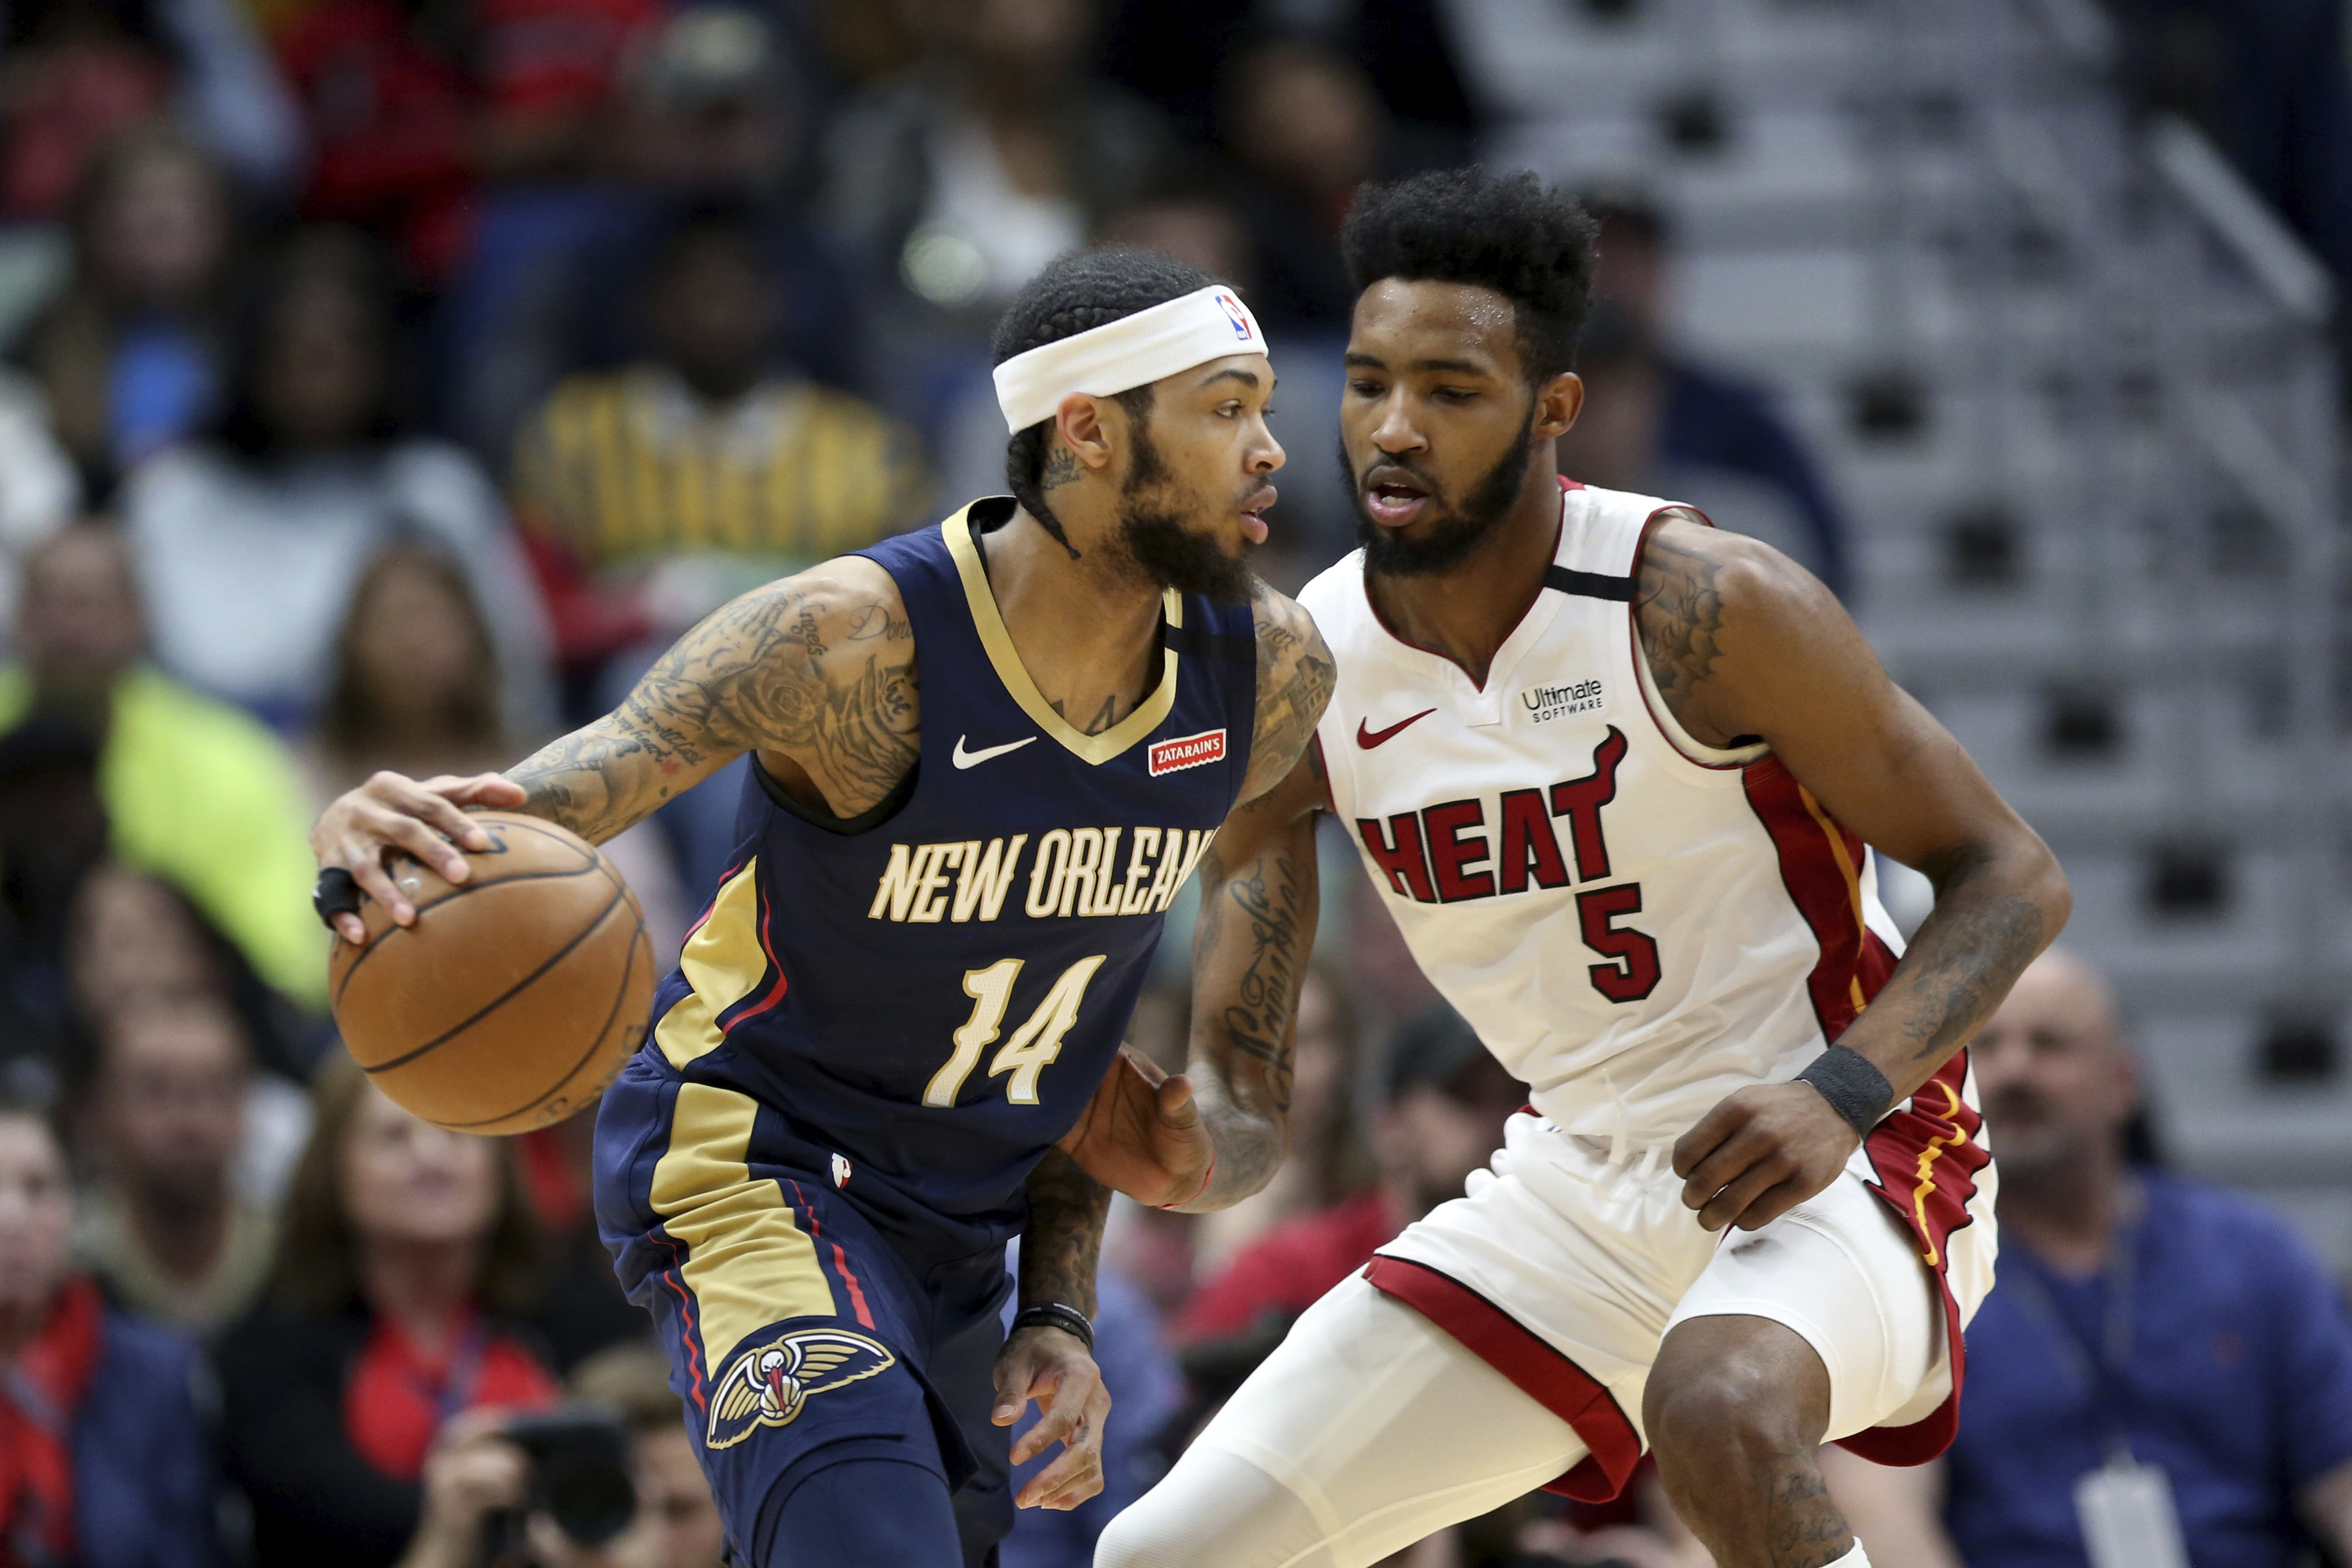 Ingram ovecomes shooting woes, helps Pelicans beat Heat